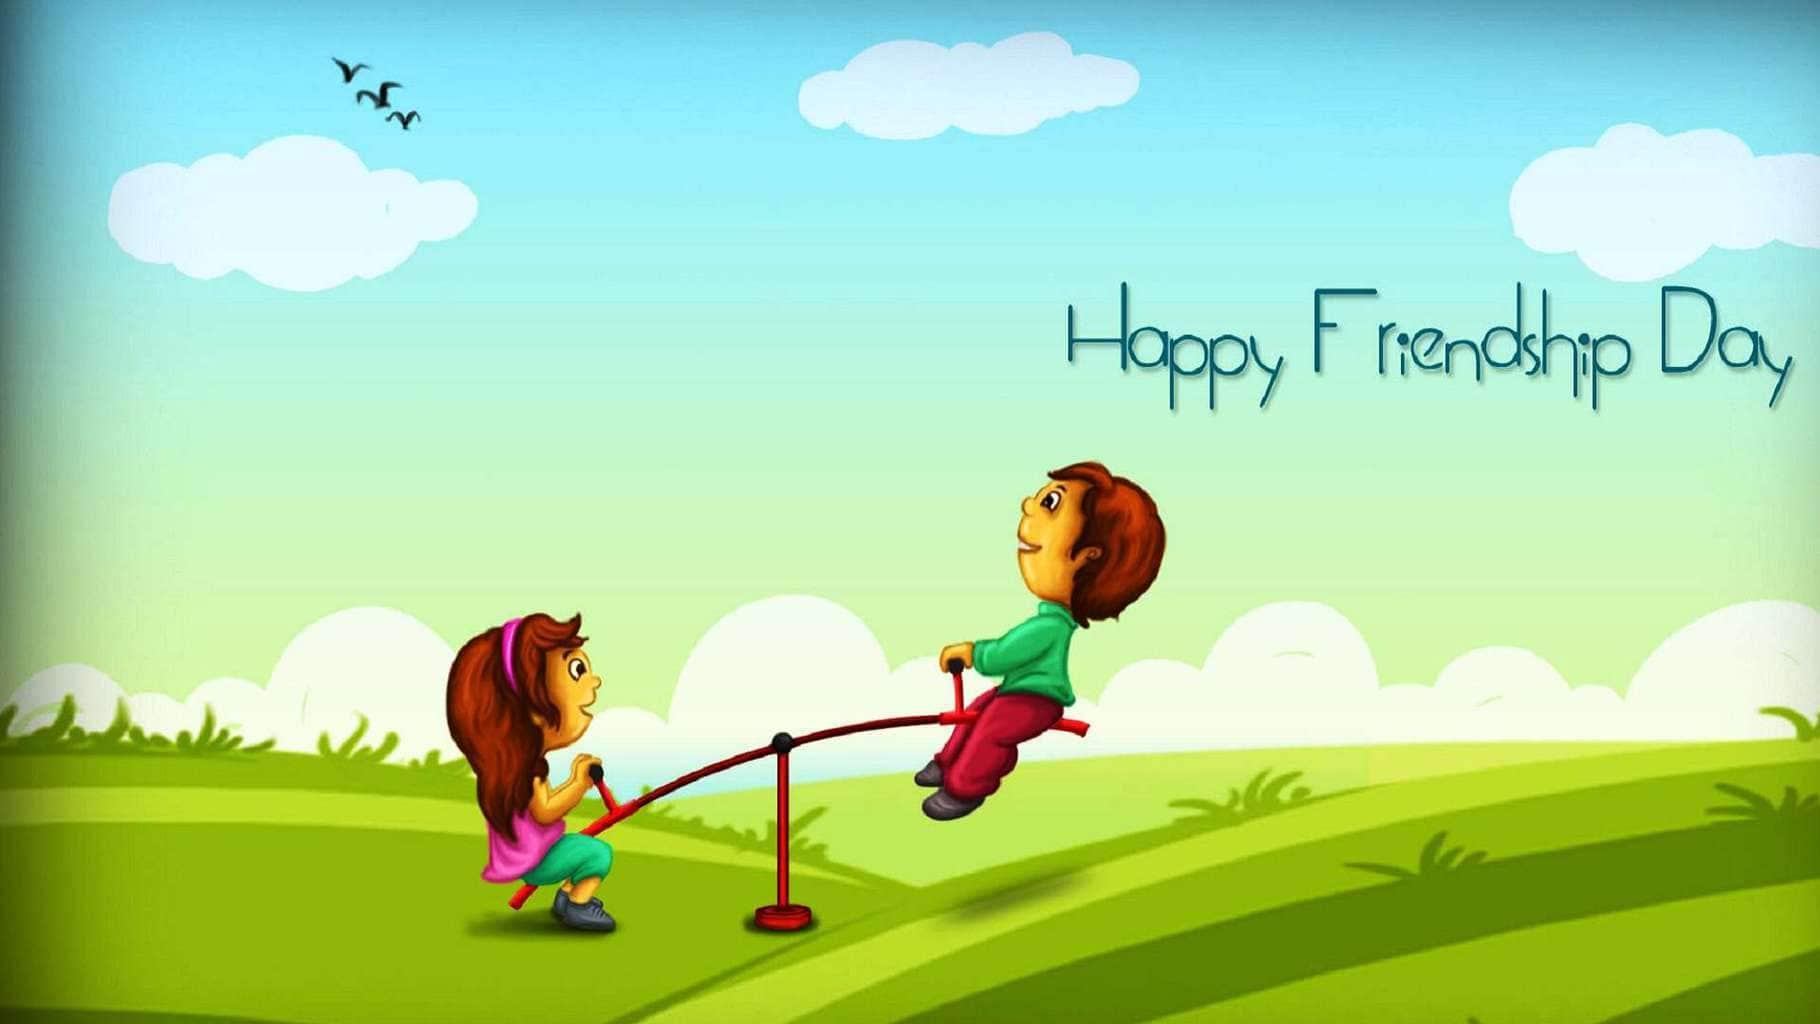 Happy-friendship-day-to-all-dear-friends